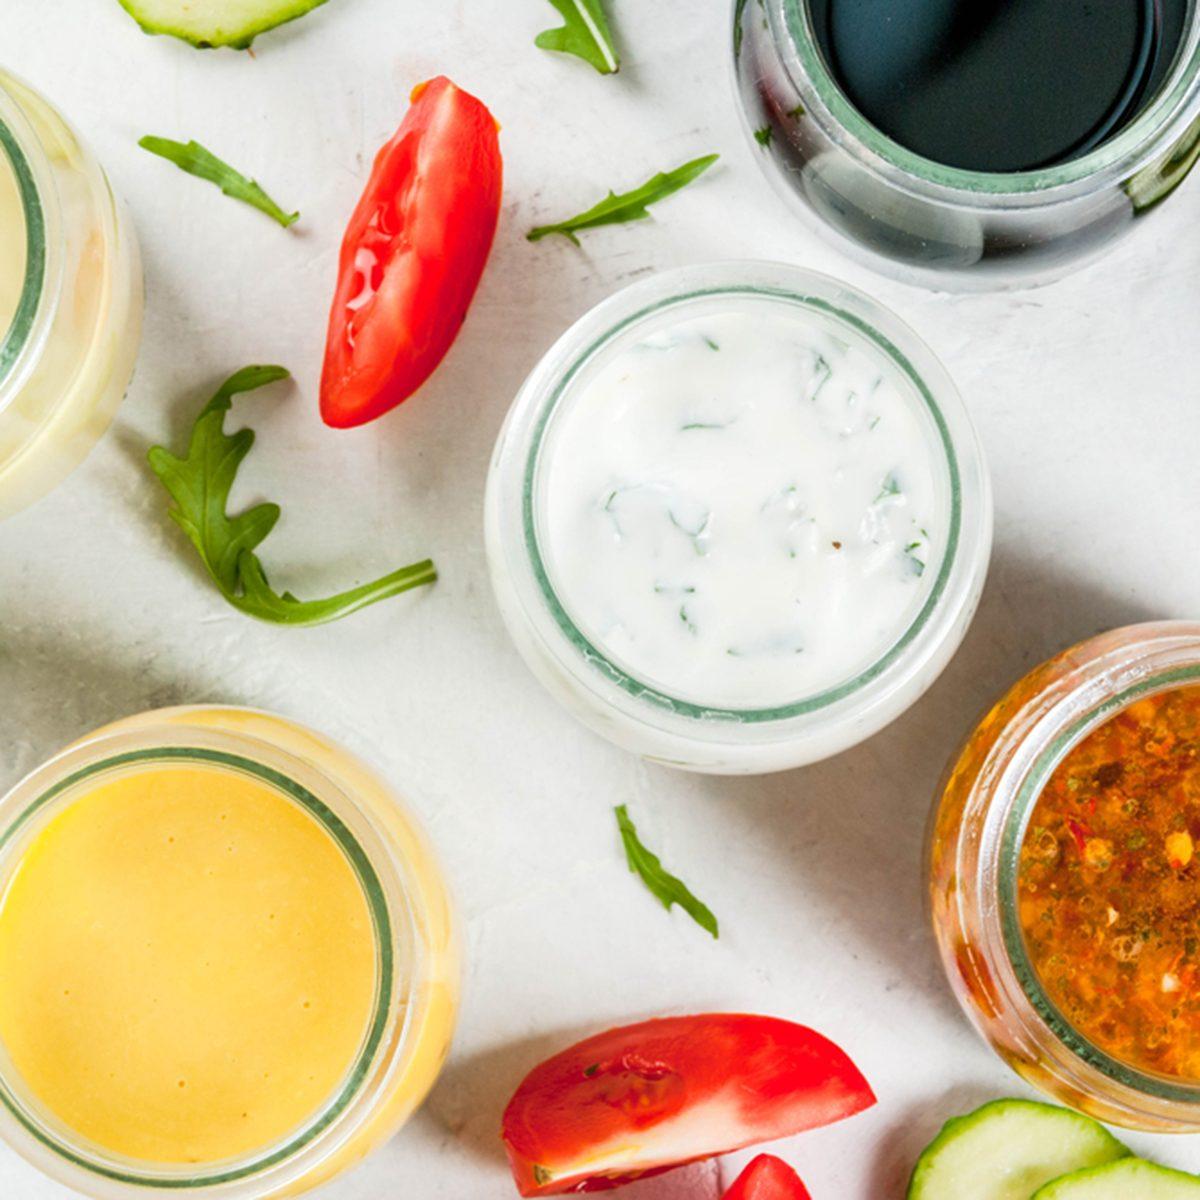 Set of dressings for salad: sauce vinaigrette, mustard, mayonnaise or ranch, balsamic or soy, basil with yogurt.